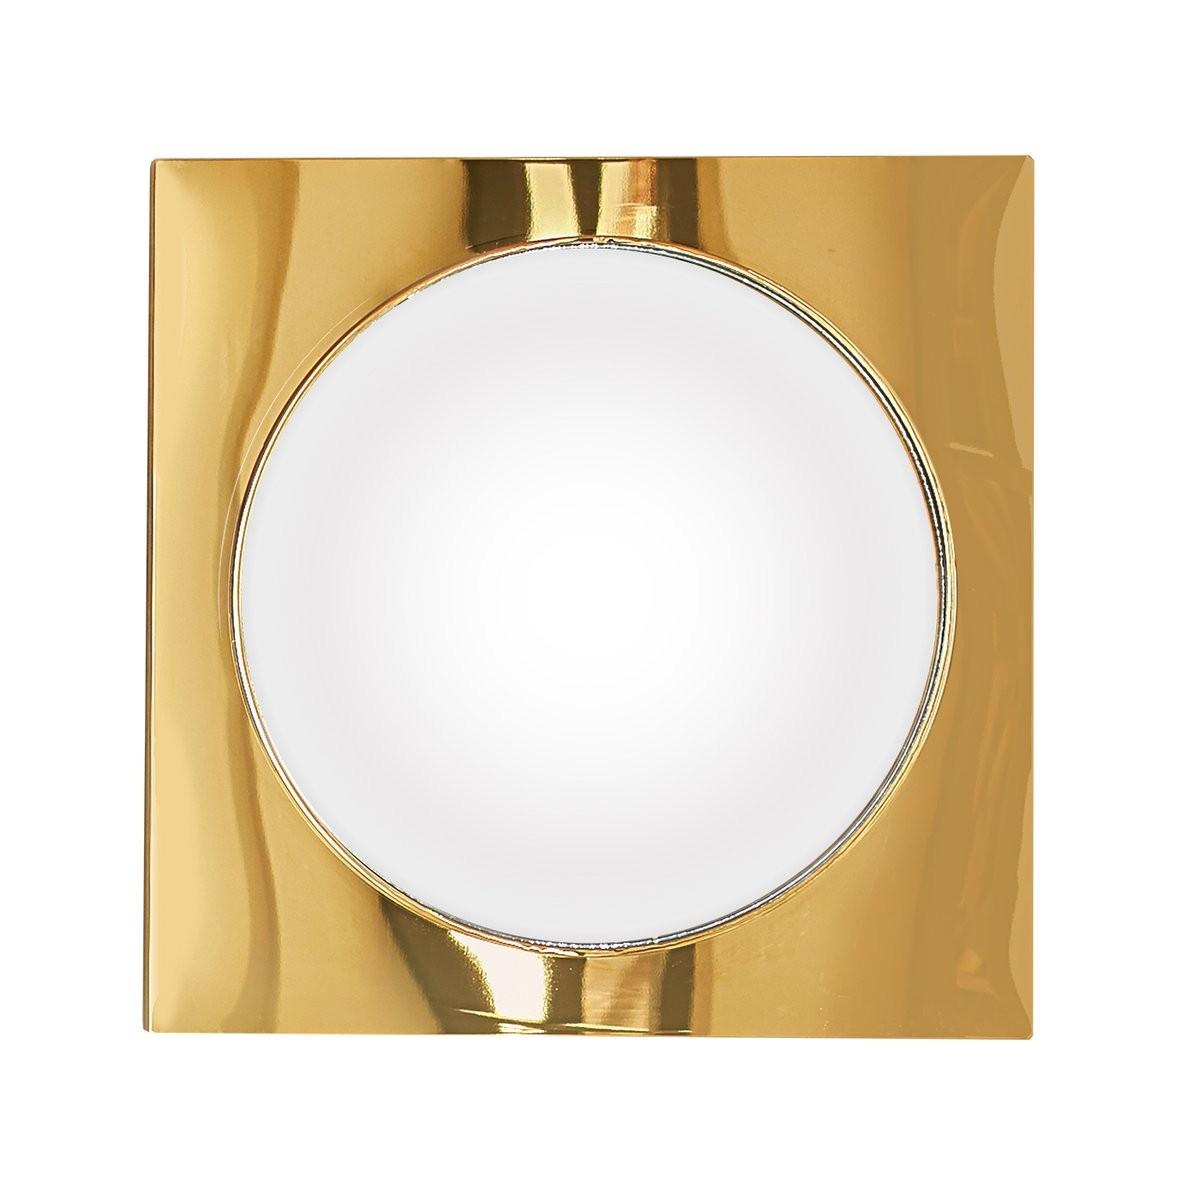 Jonathan Adler I Globo Convex Mirror